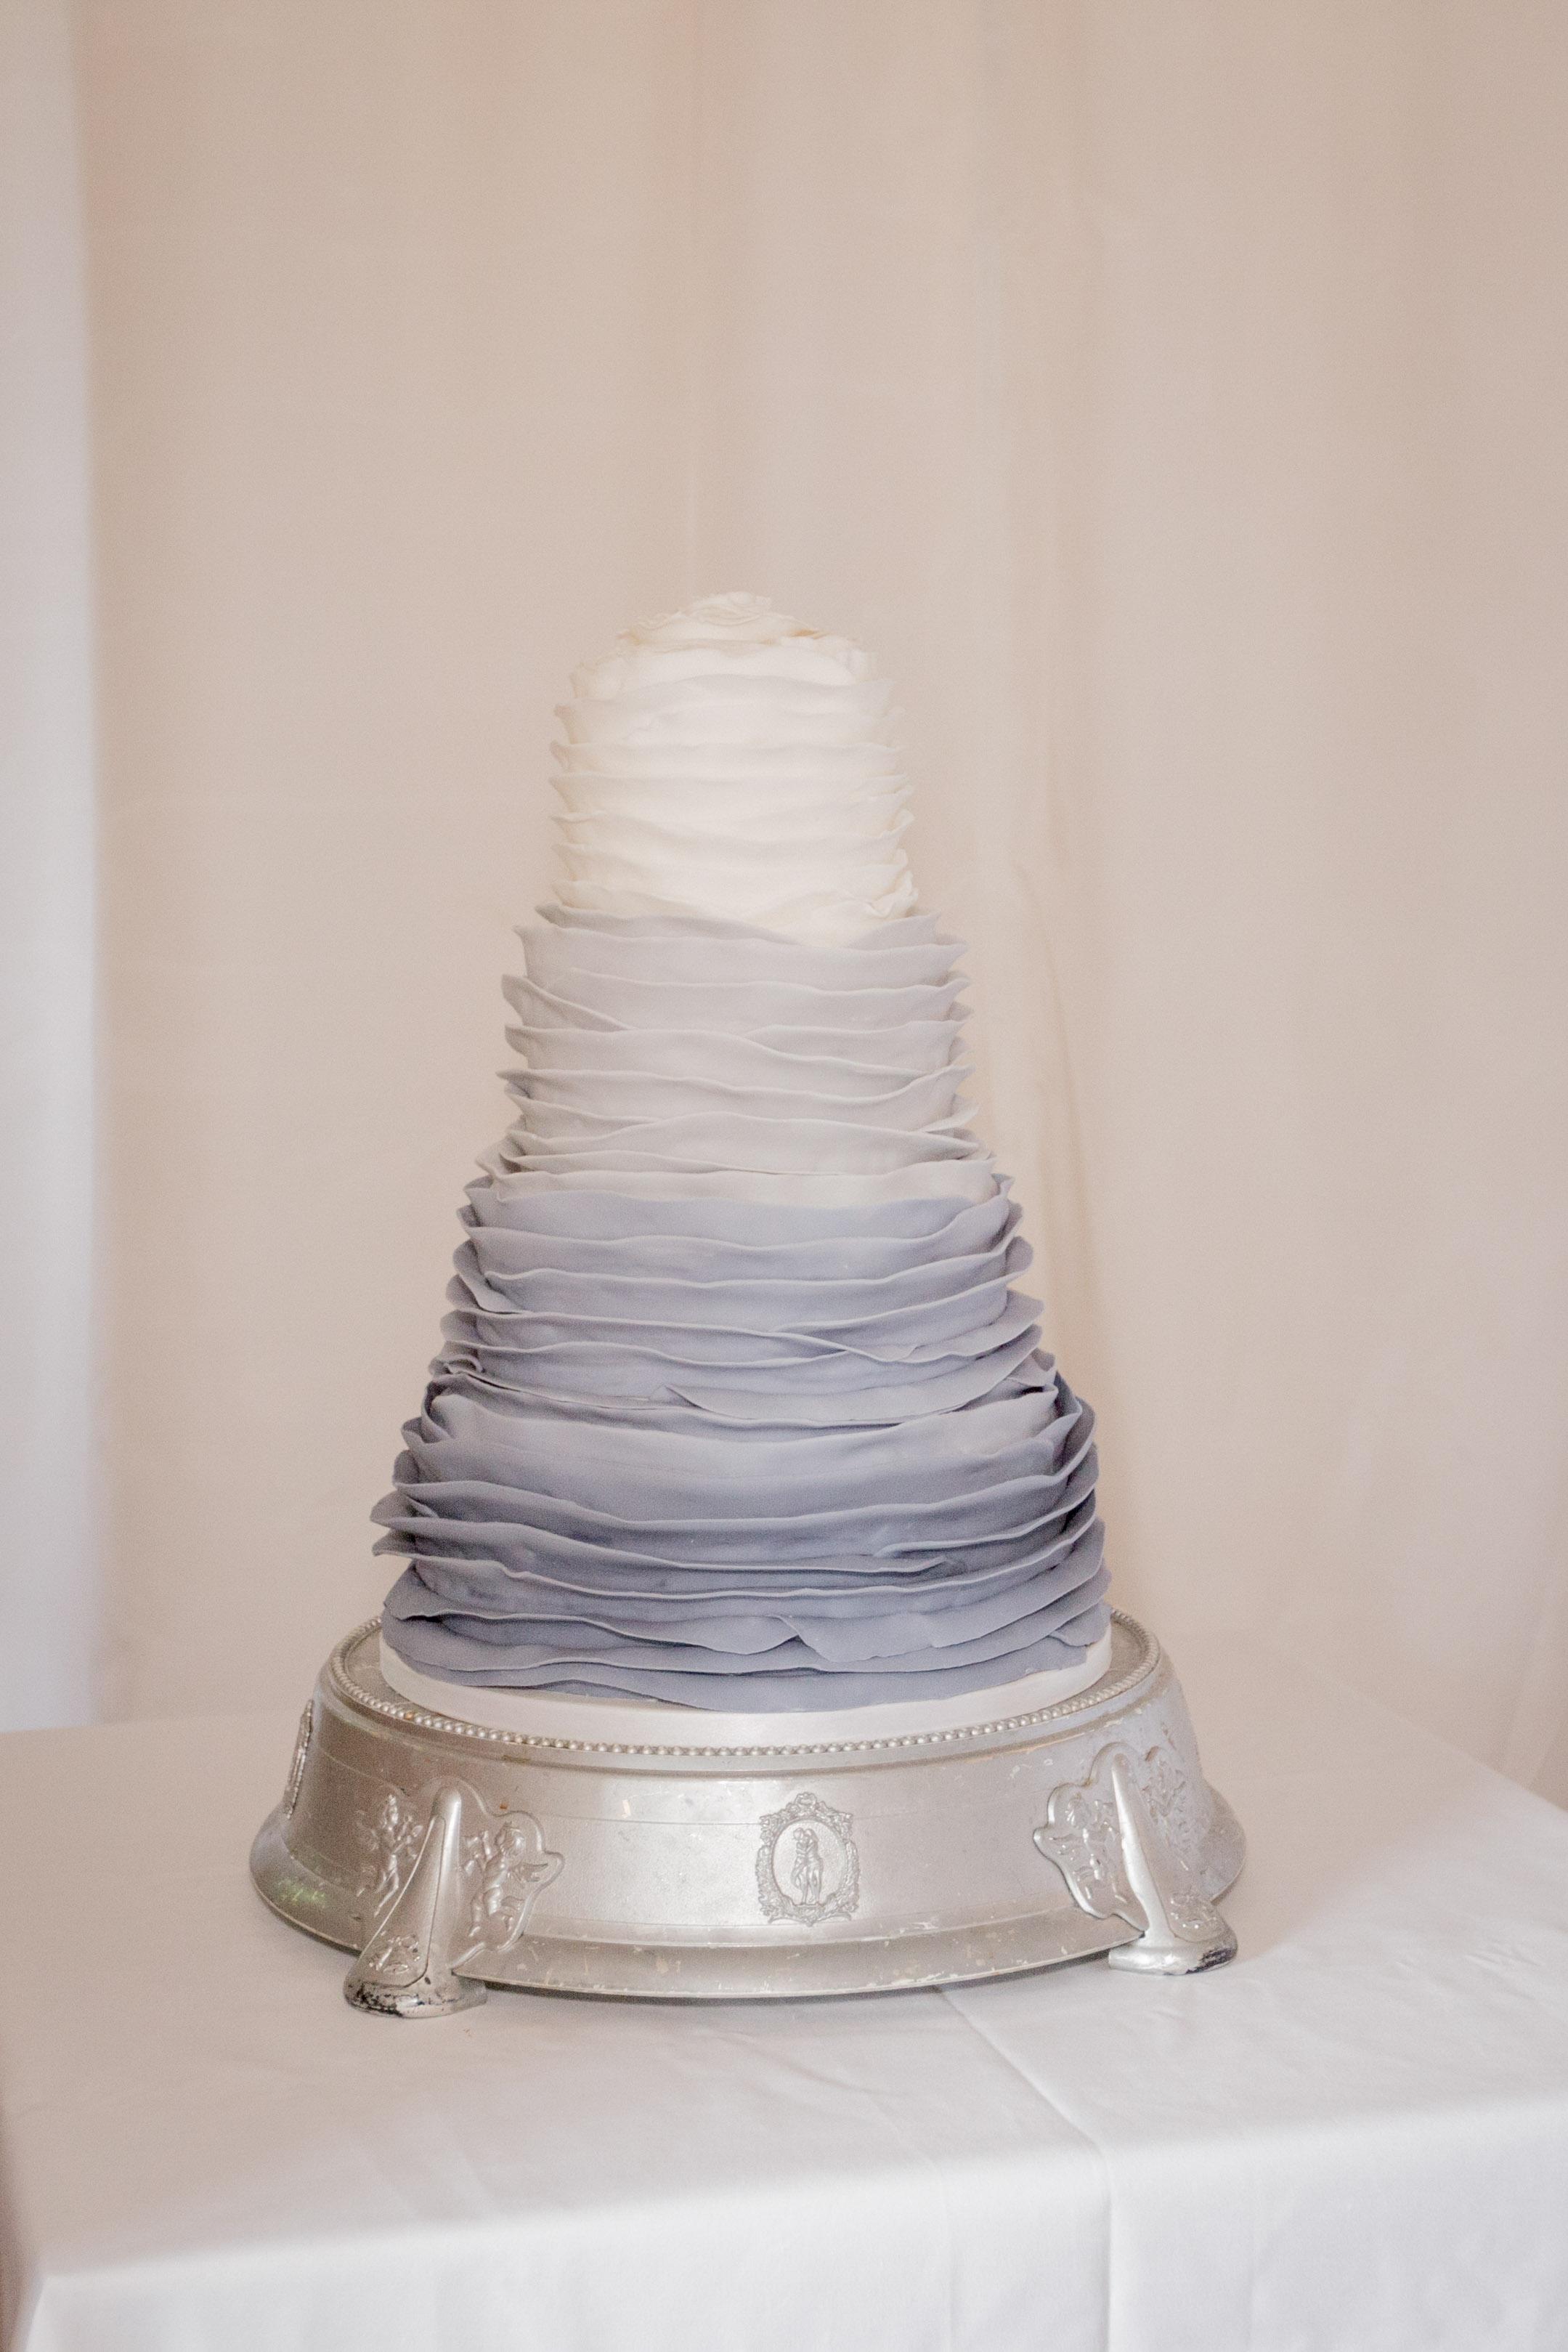 cotswold-wedding-photography-at-stonehouse-court-hotel-natalia-smith-photography-gloucestershire-wedding-photographer-58.jpg